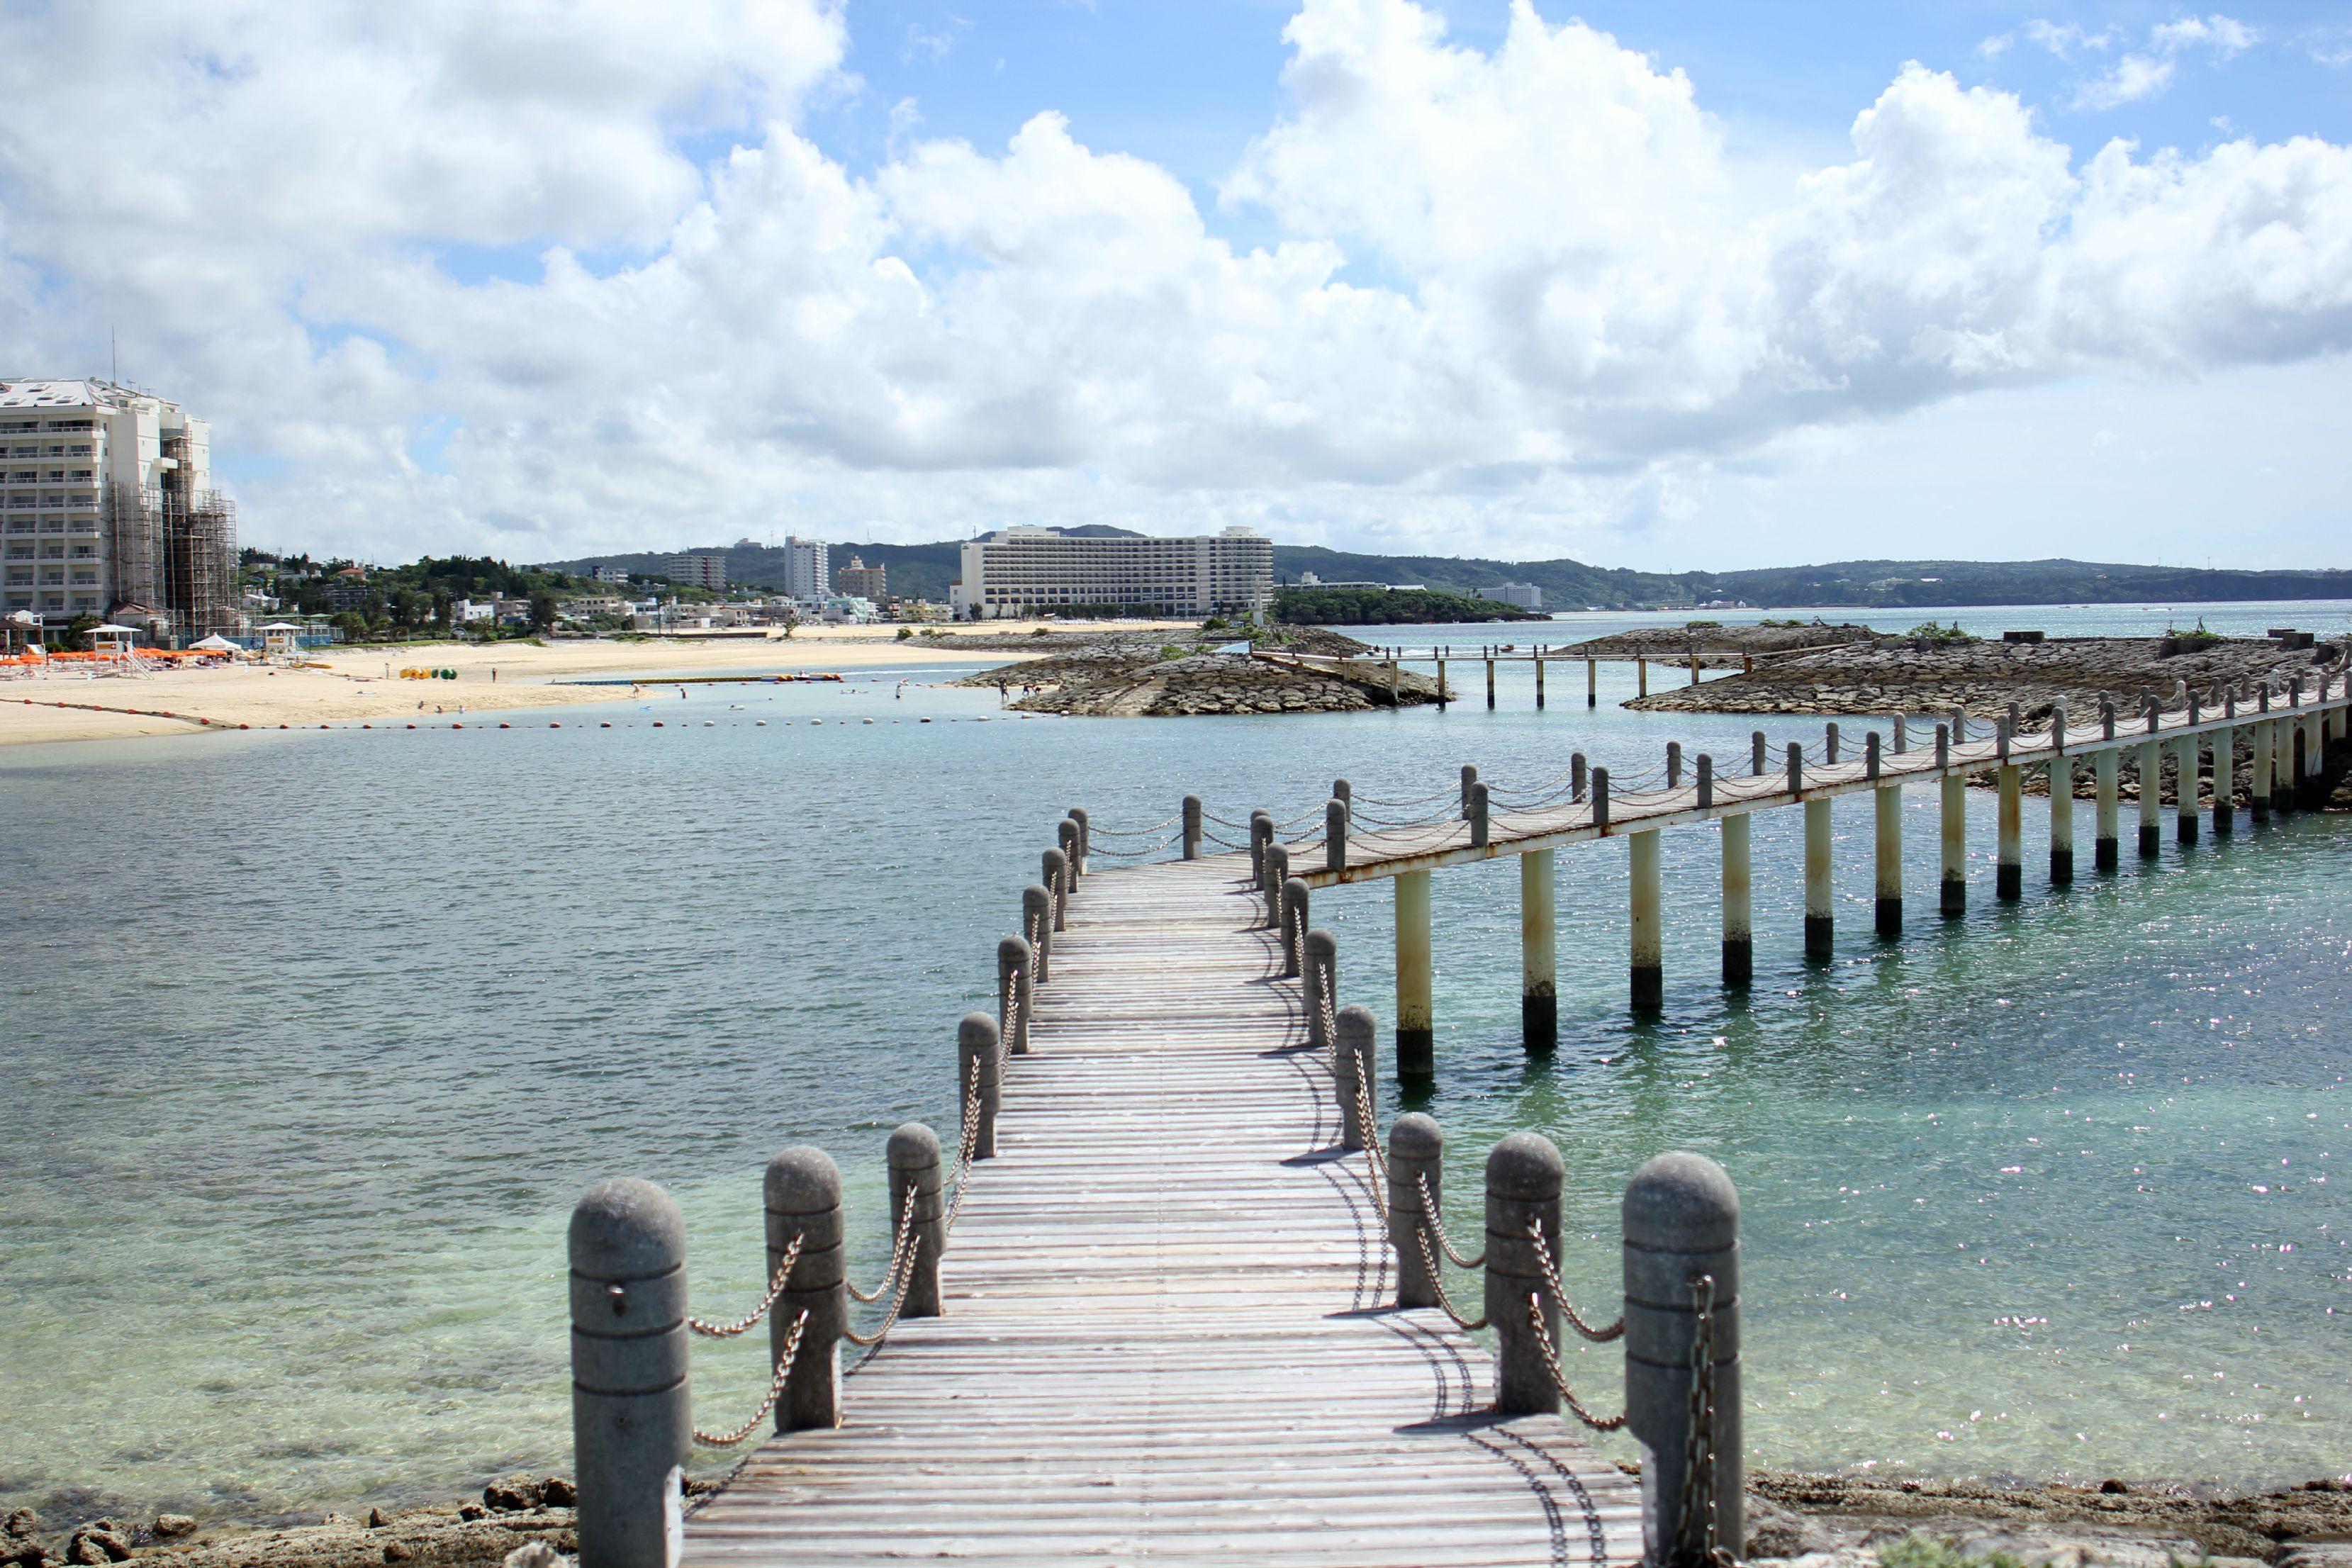 The Bridge at Sun Marina Beach